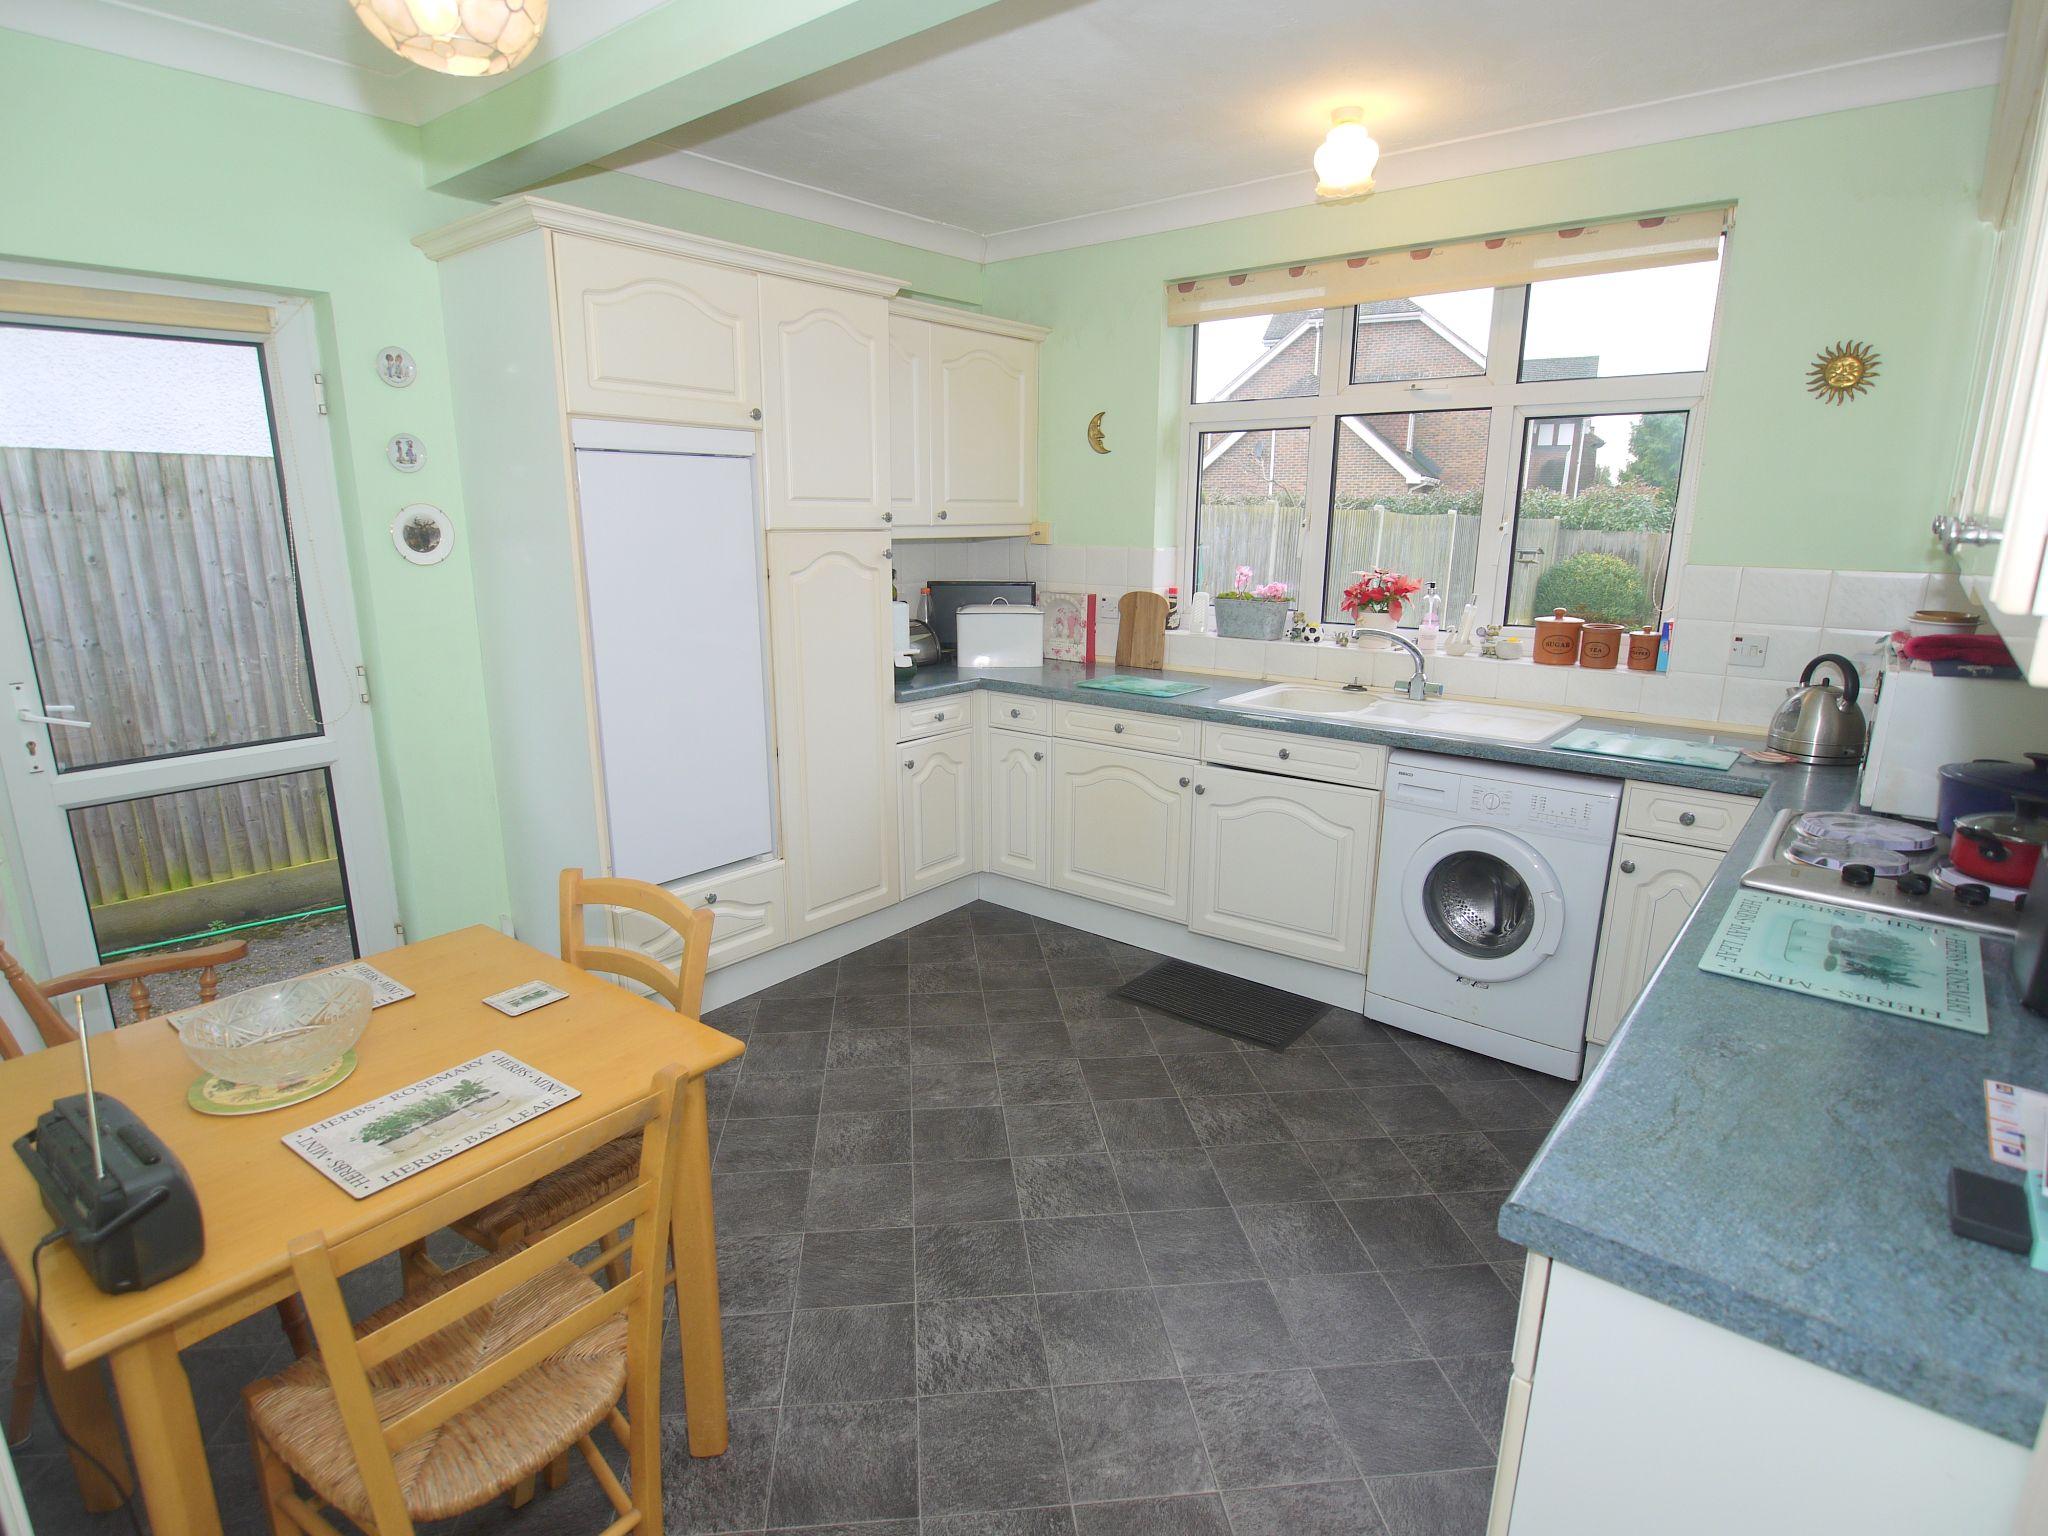 3 bedroom detached bungalow Sold in Sevenoaks - Photograph 4